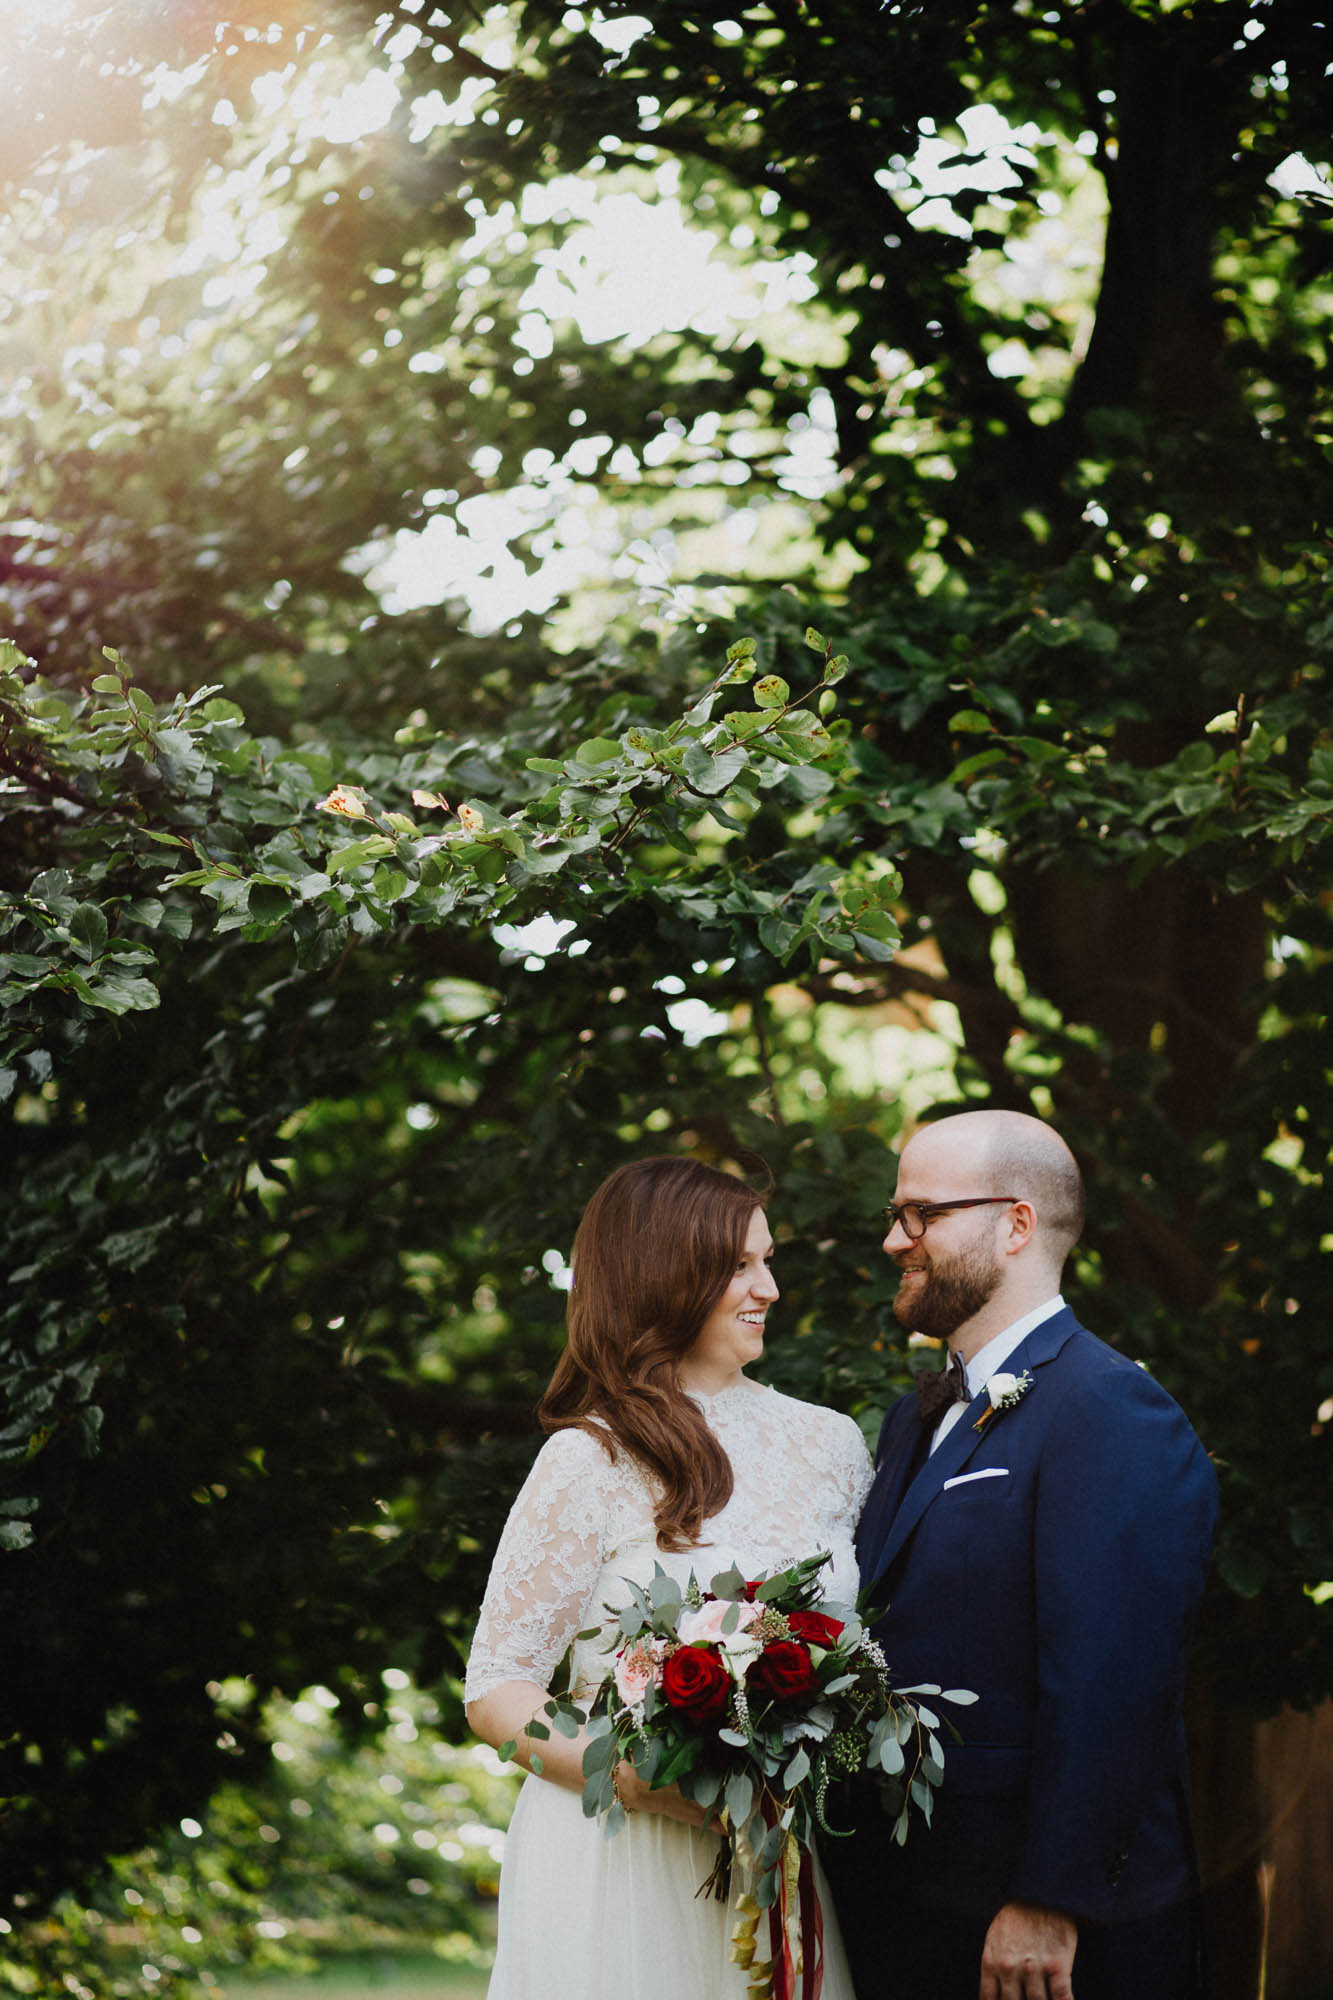 Highline-Car-House-Wedding-Columbus-Kristin-Aaron-046.jpg